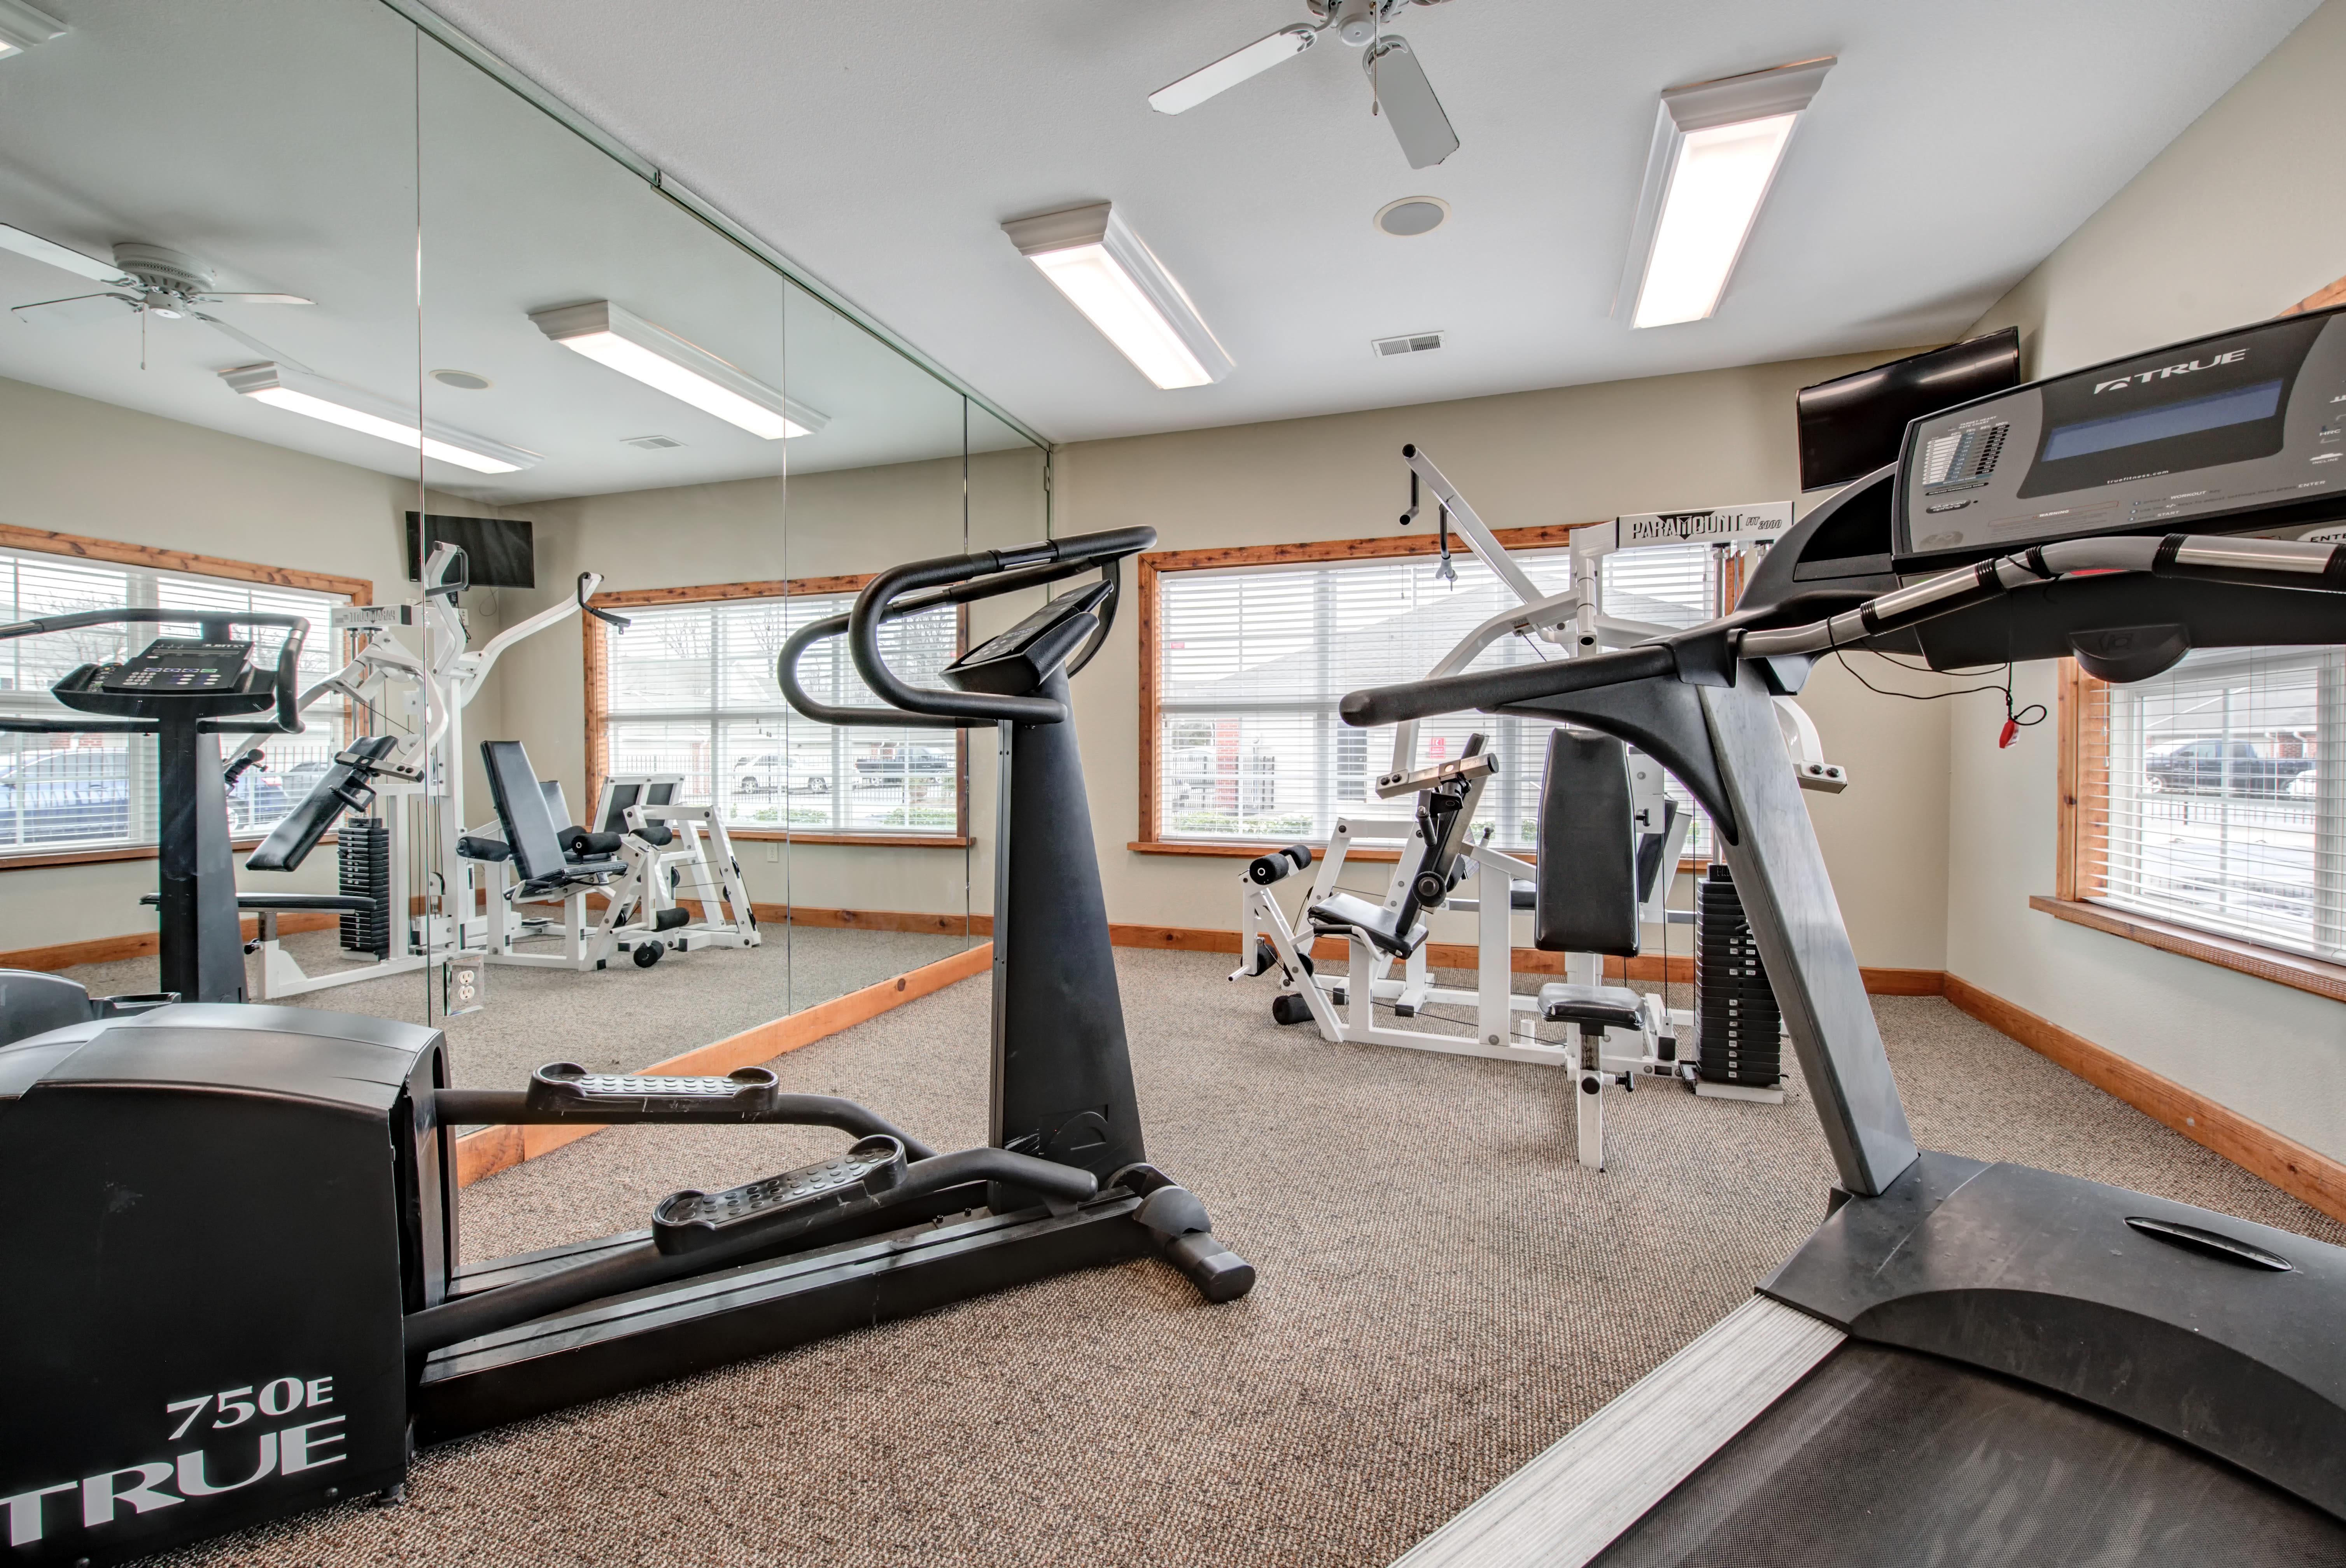 Fitness area at Renaissance St. Andrews in Louisville, Kentucky.